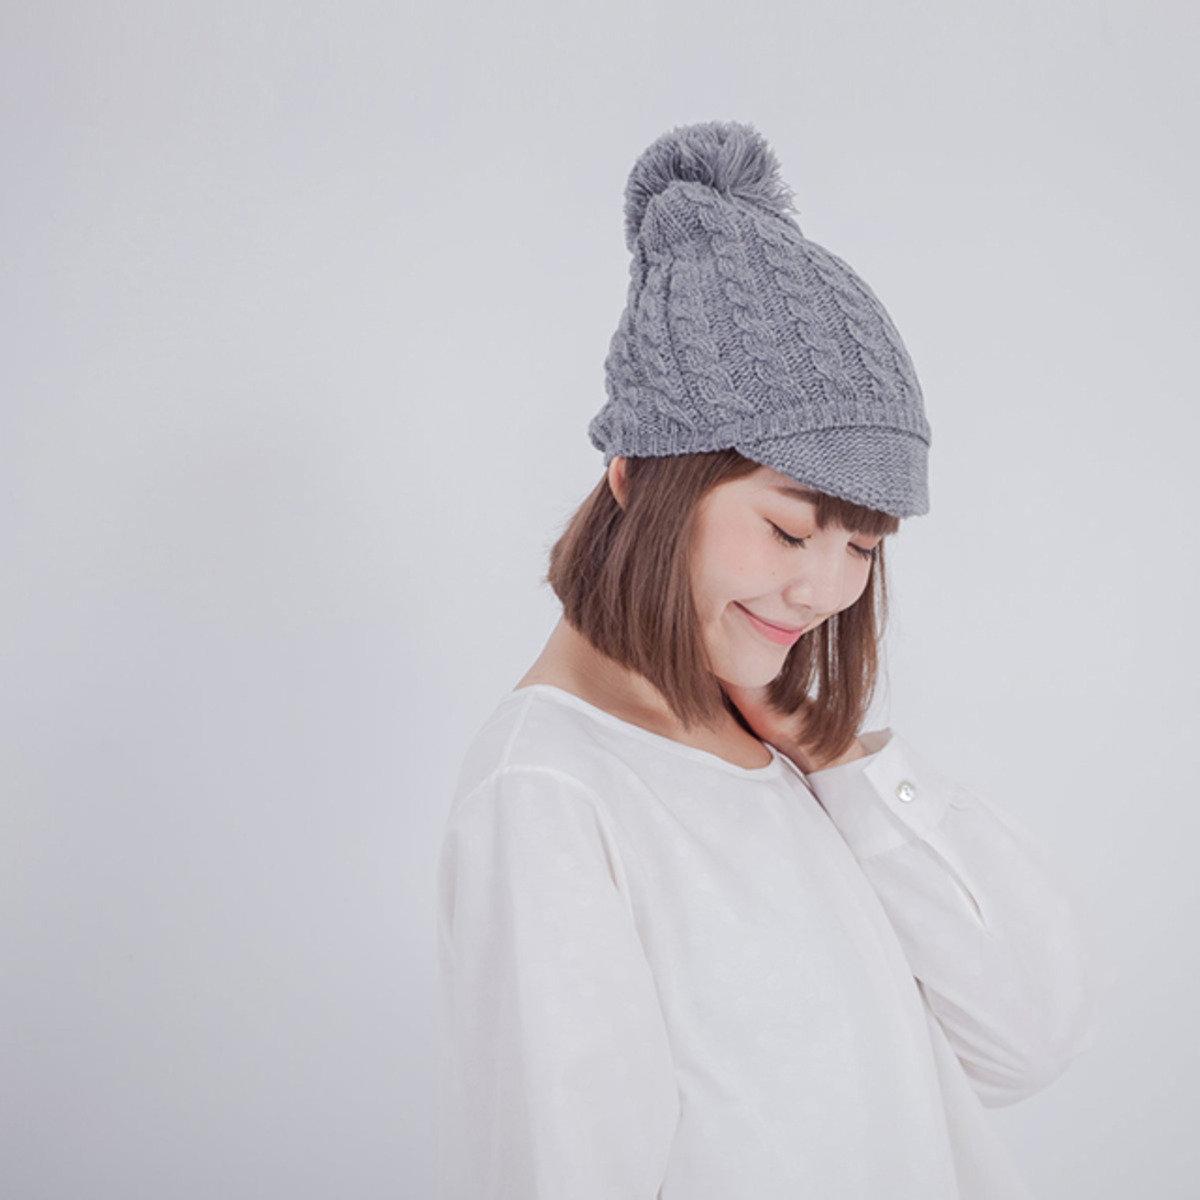 Ivory 麻花帽筵針織毛帽/中灰